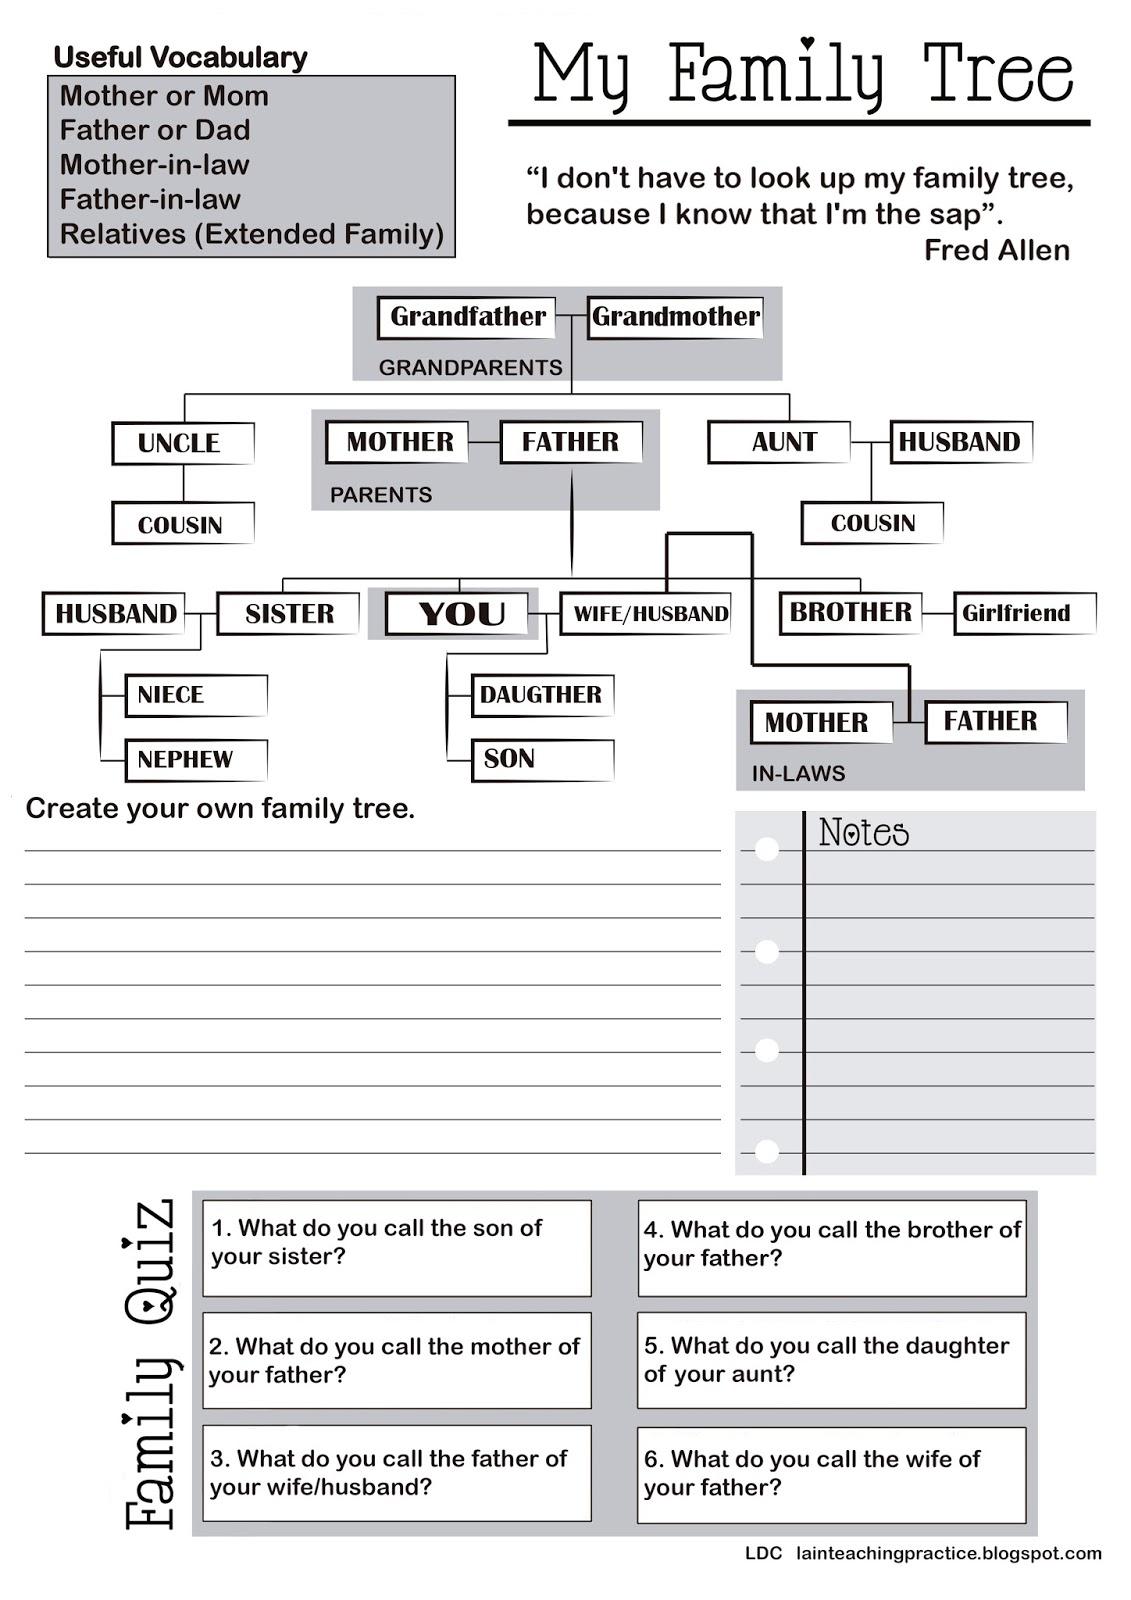 lain teaching practice my family tree